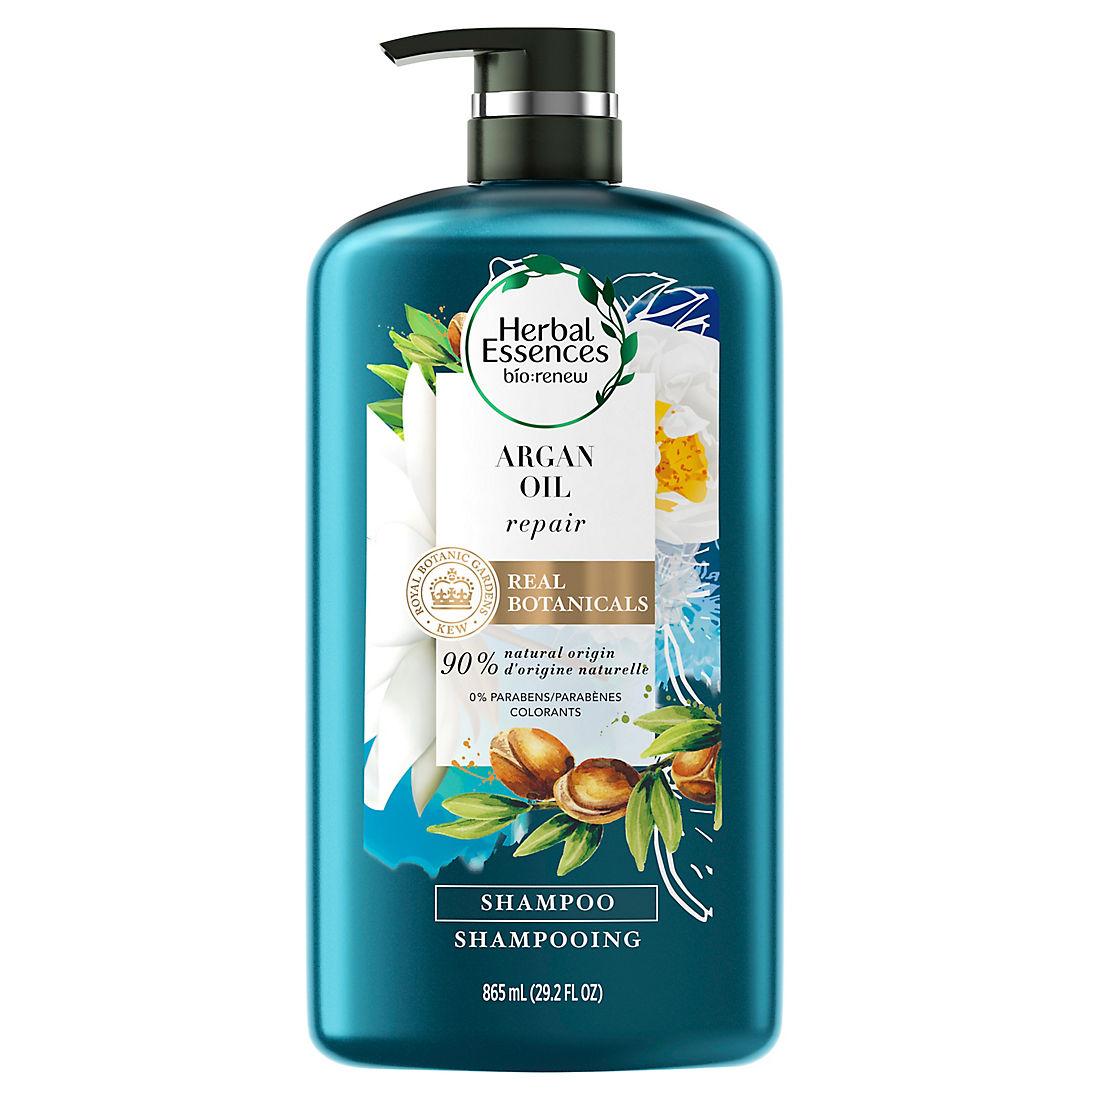 graphic regarding Herbal Essences Coupons Printable named Natural Essences bio:renew Argan Oil of Morocco Shampoo, 29.2 fl. oz.